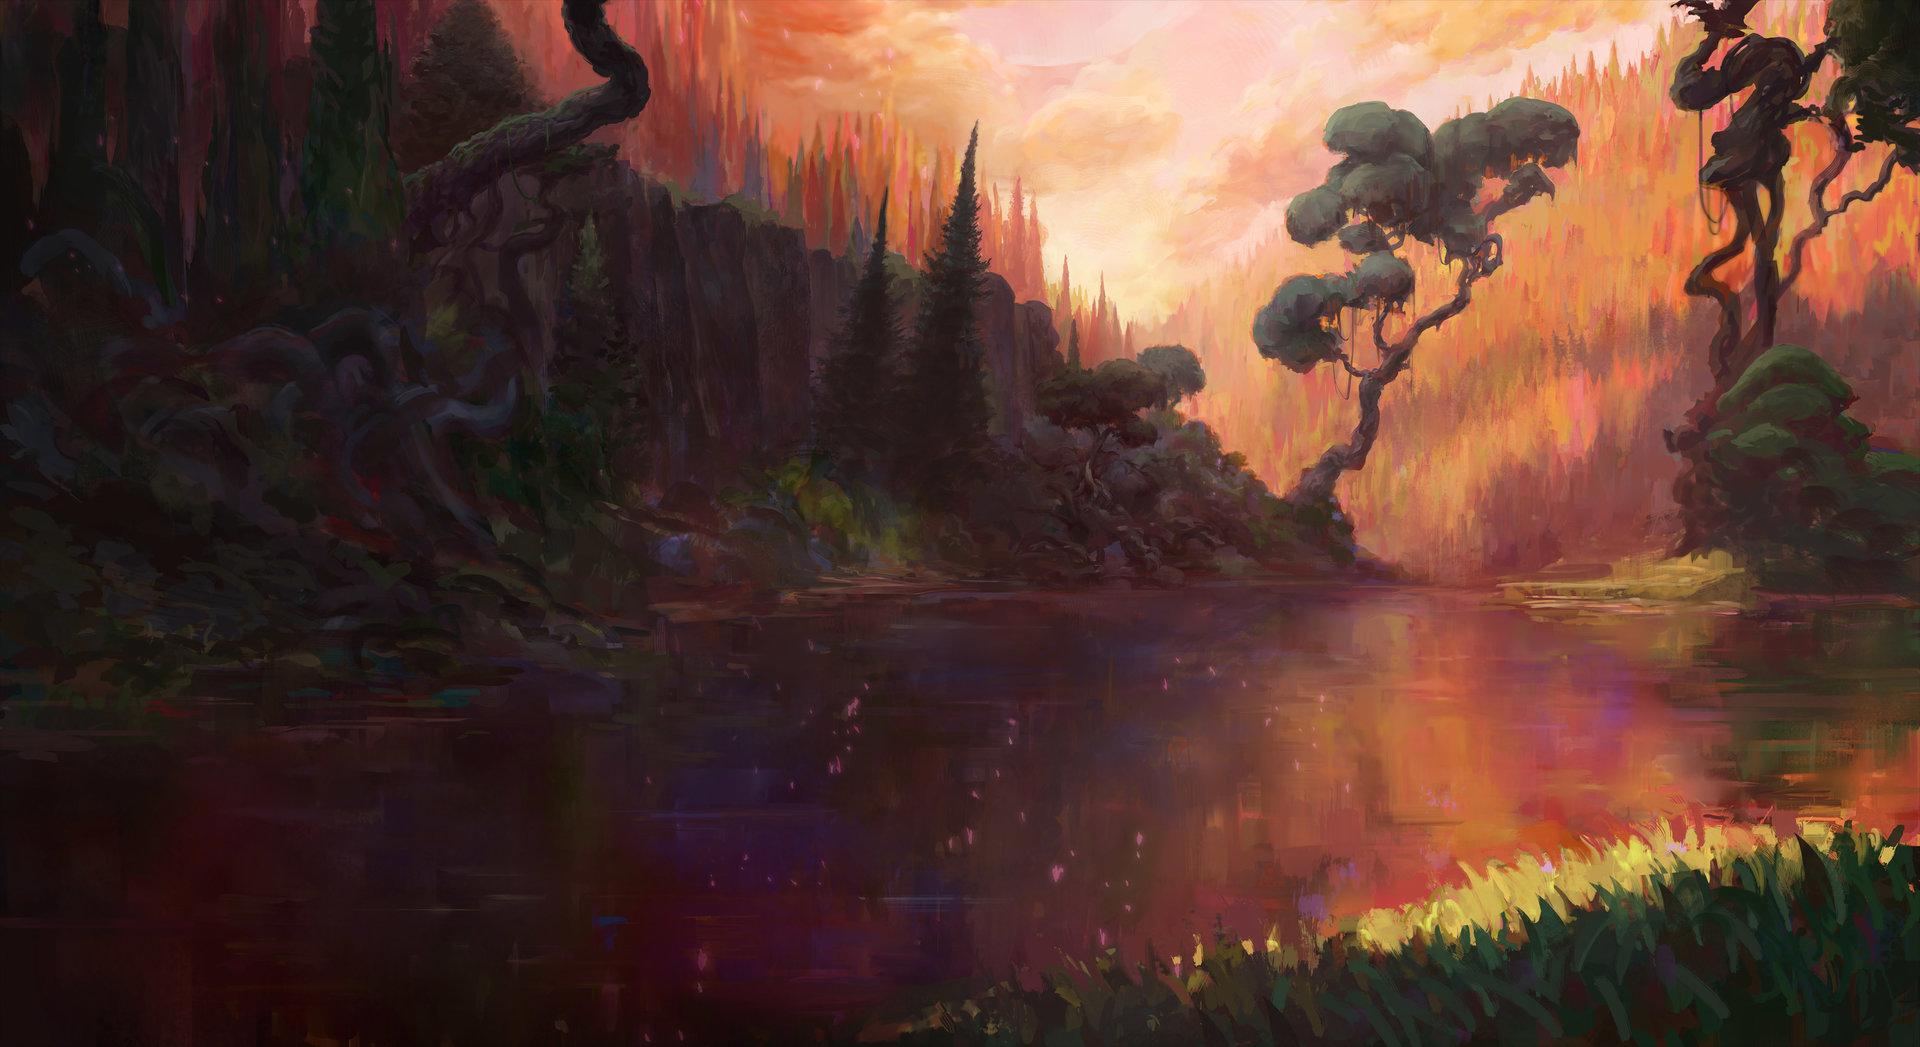 arborea d&d next Il Piano di Arborea in 5a edizione (D&D Next) - by Olly Lawson Dungeon Master's Guide (2014-12) © Wizards of the Coast